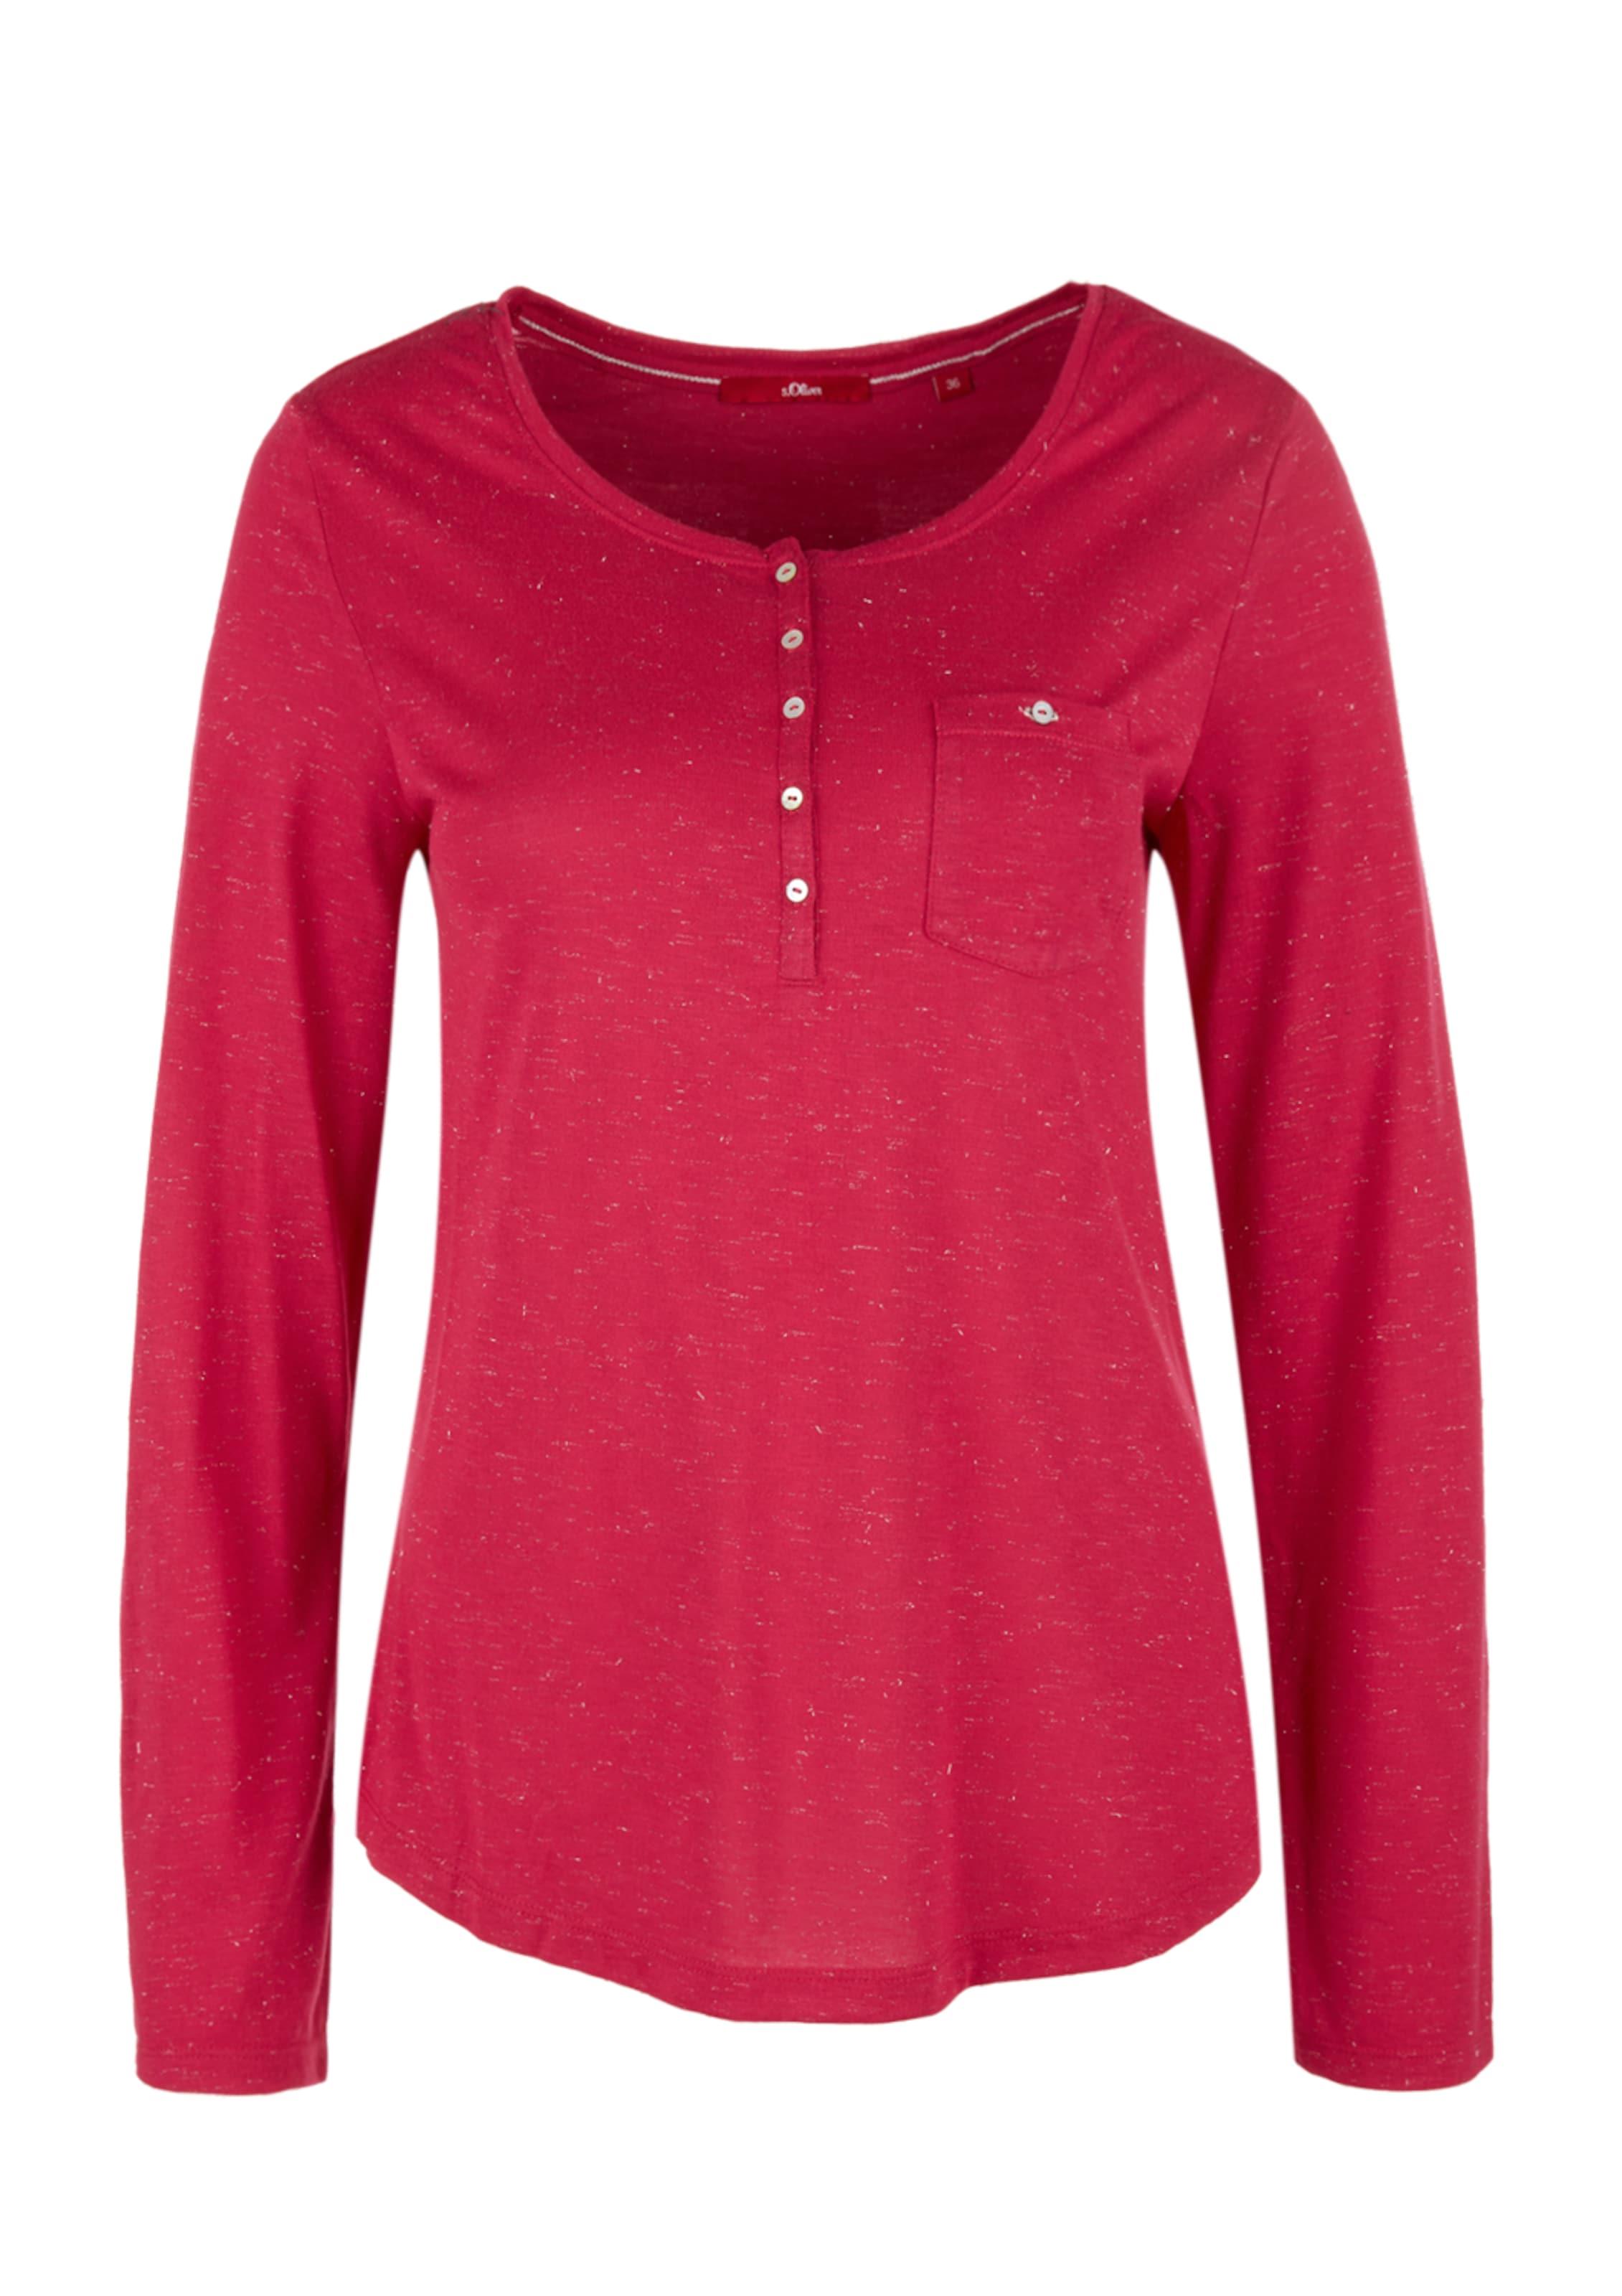 Shirt In Pitaya Red Label oliver S OkPXZui